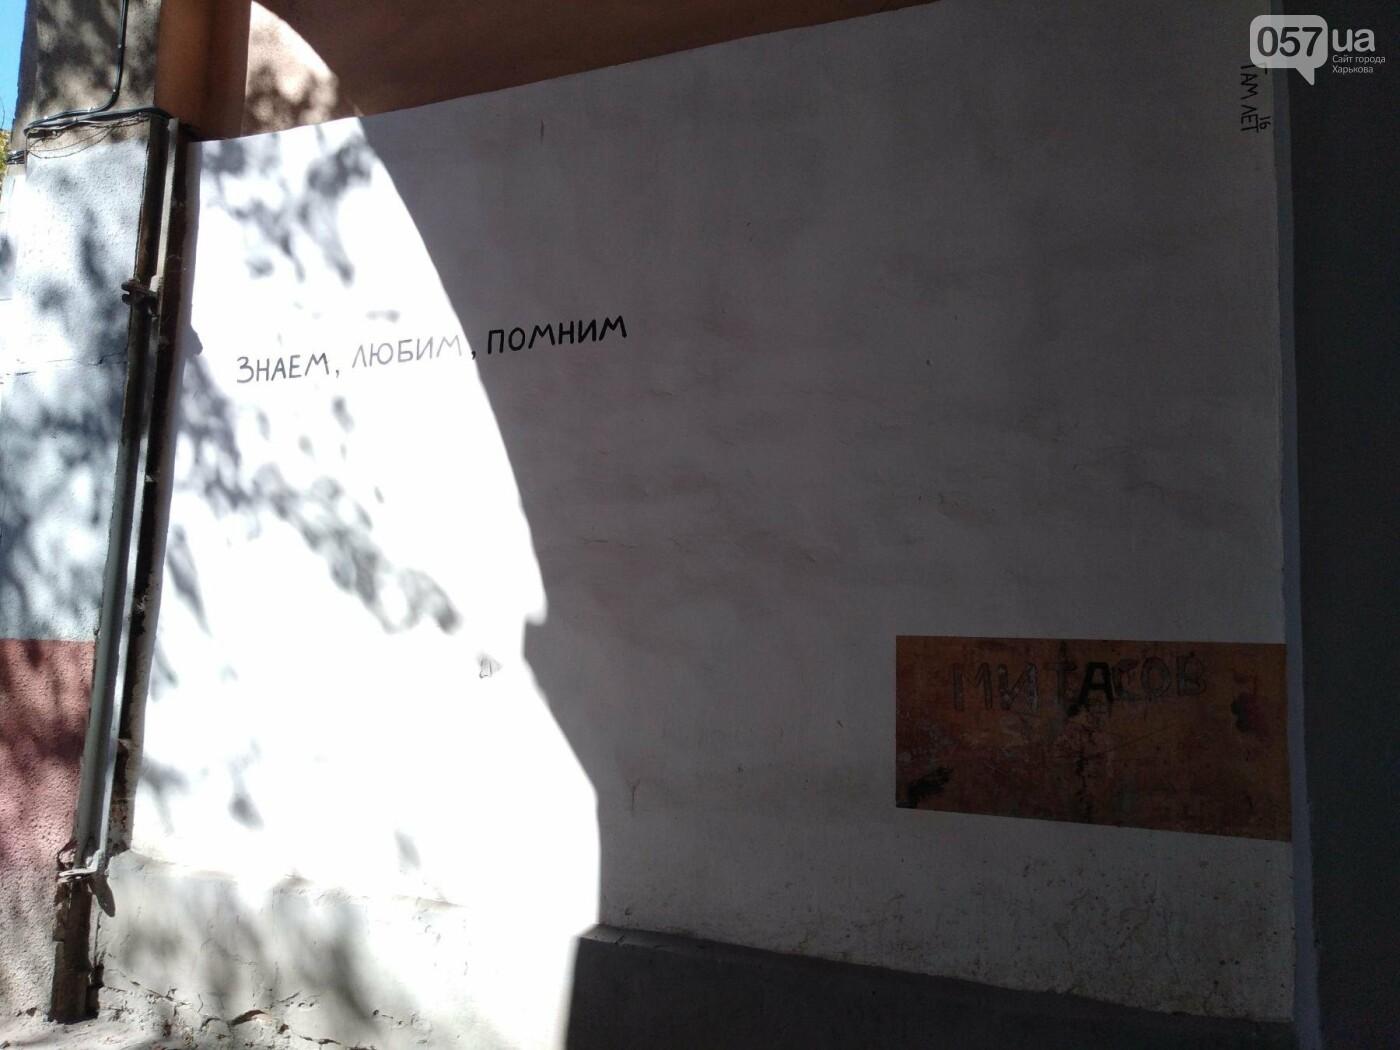 Стрит-арт Гамлета в Харькове: ТОП-10 граффити художника, - ФОТО, фото-10